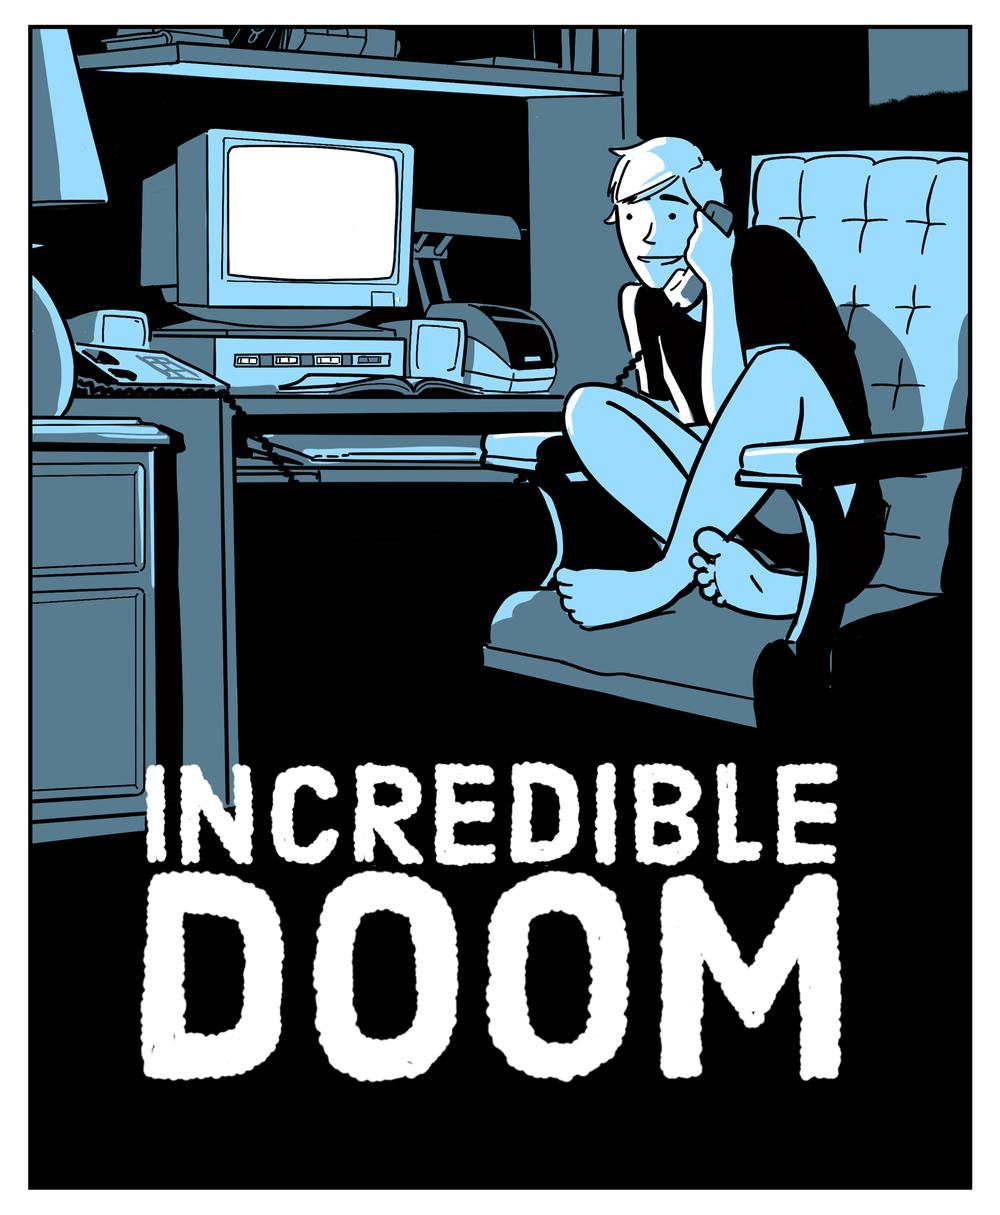 Incredible_Doom_01.png